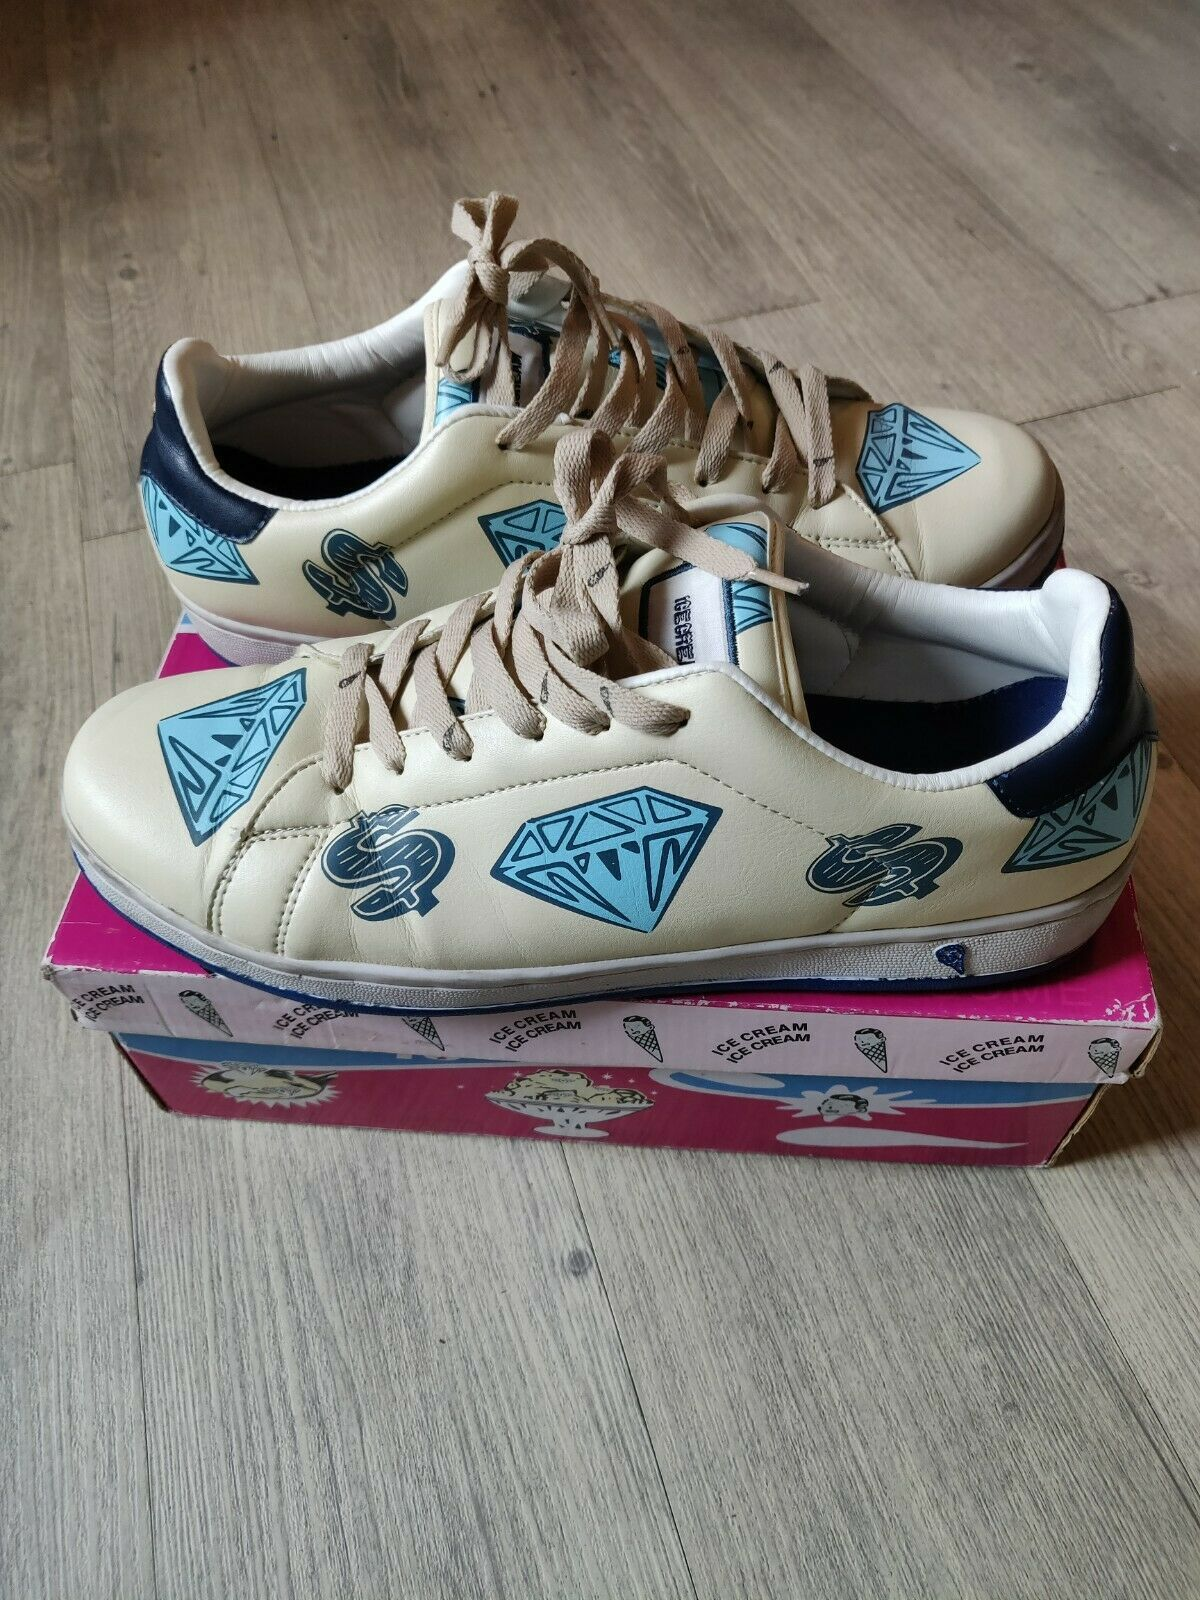 Reebok BBC Ice Cream shoes Pharrell